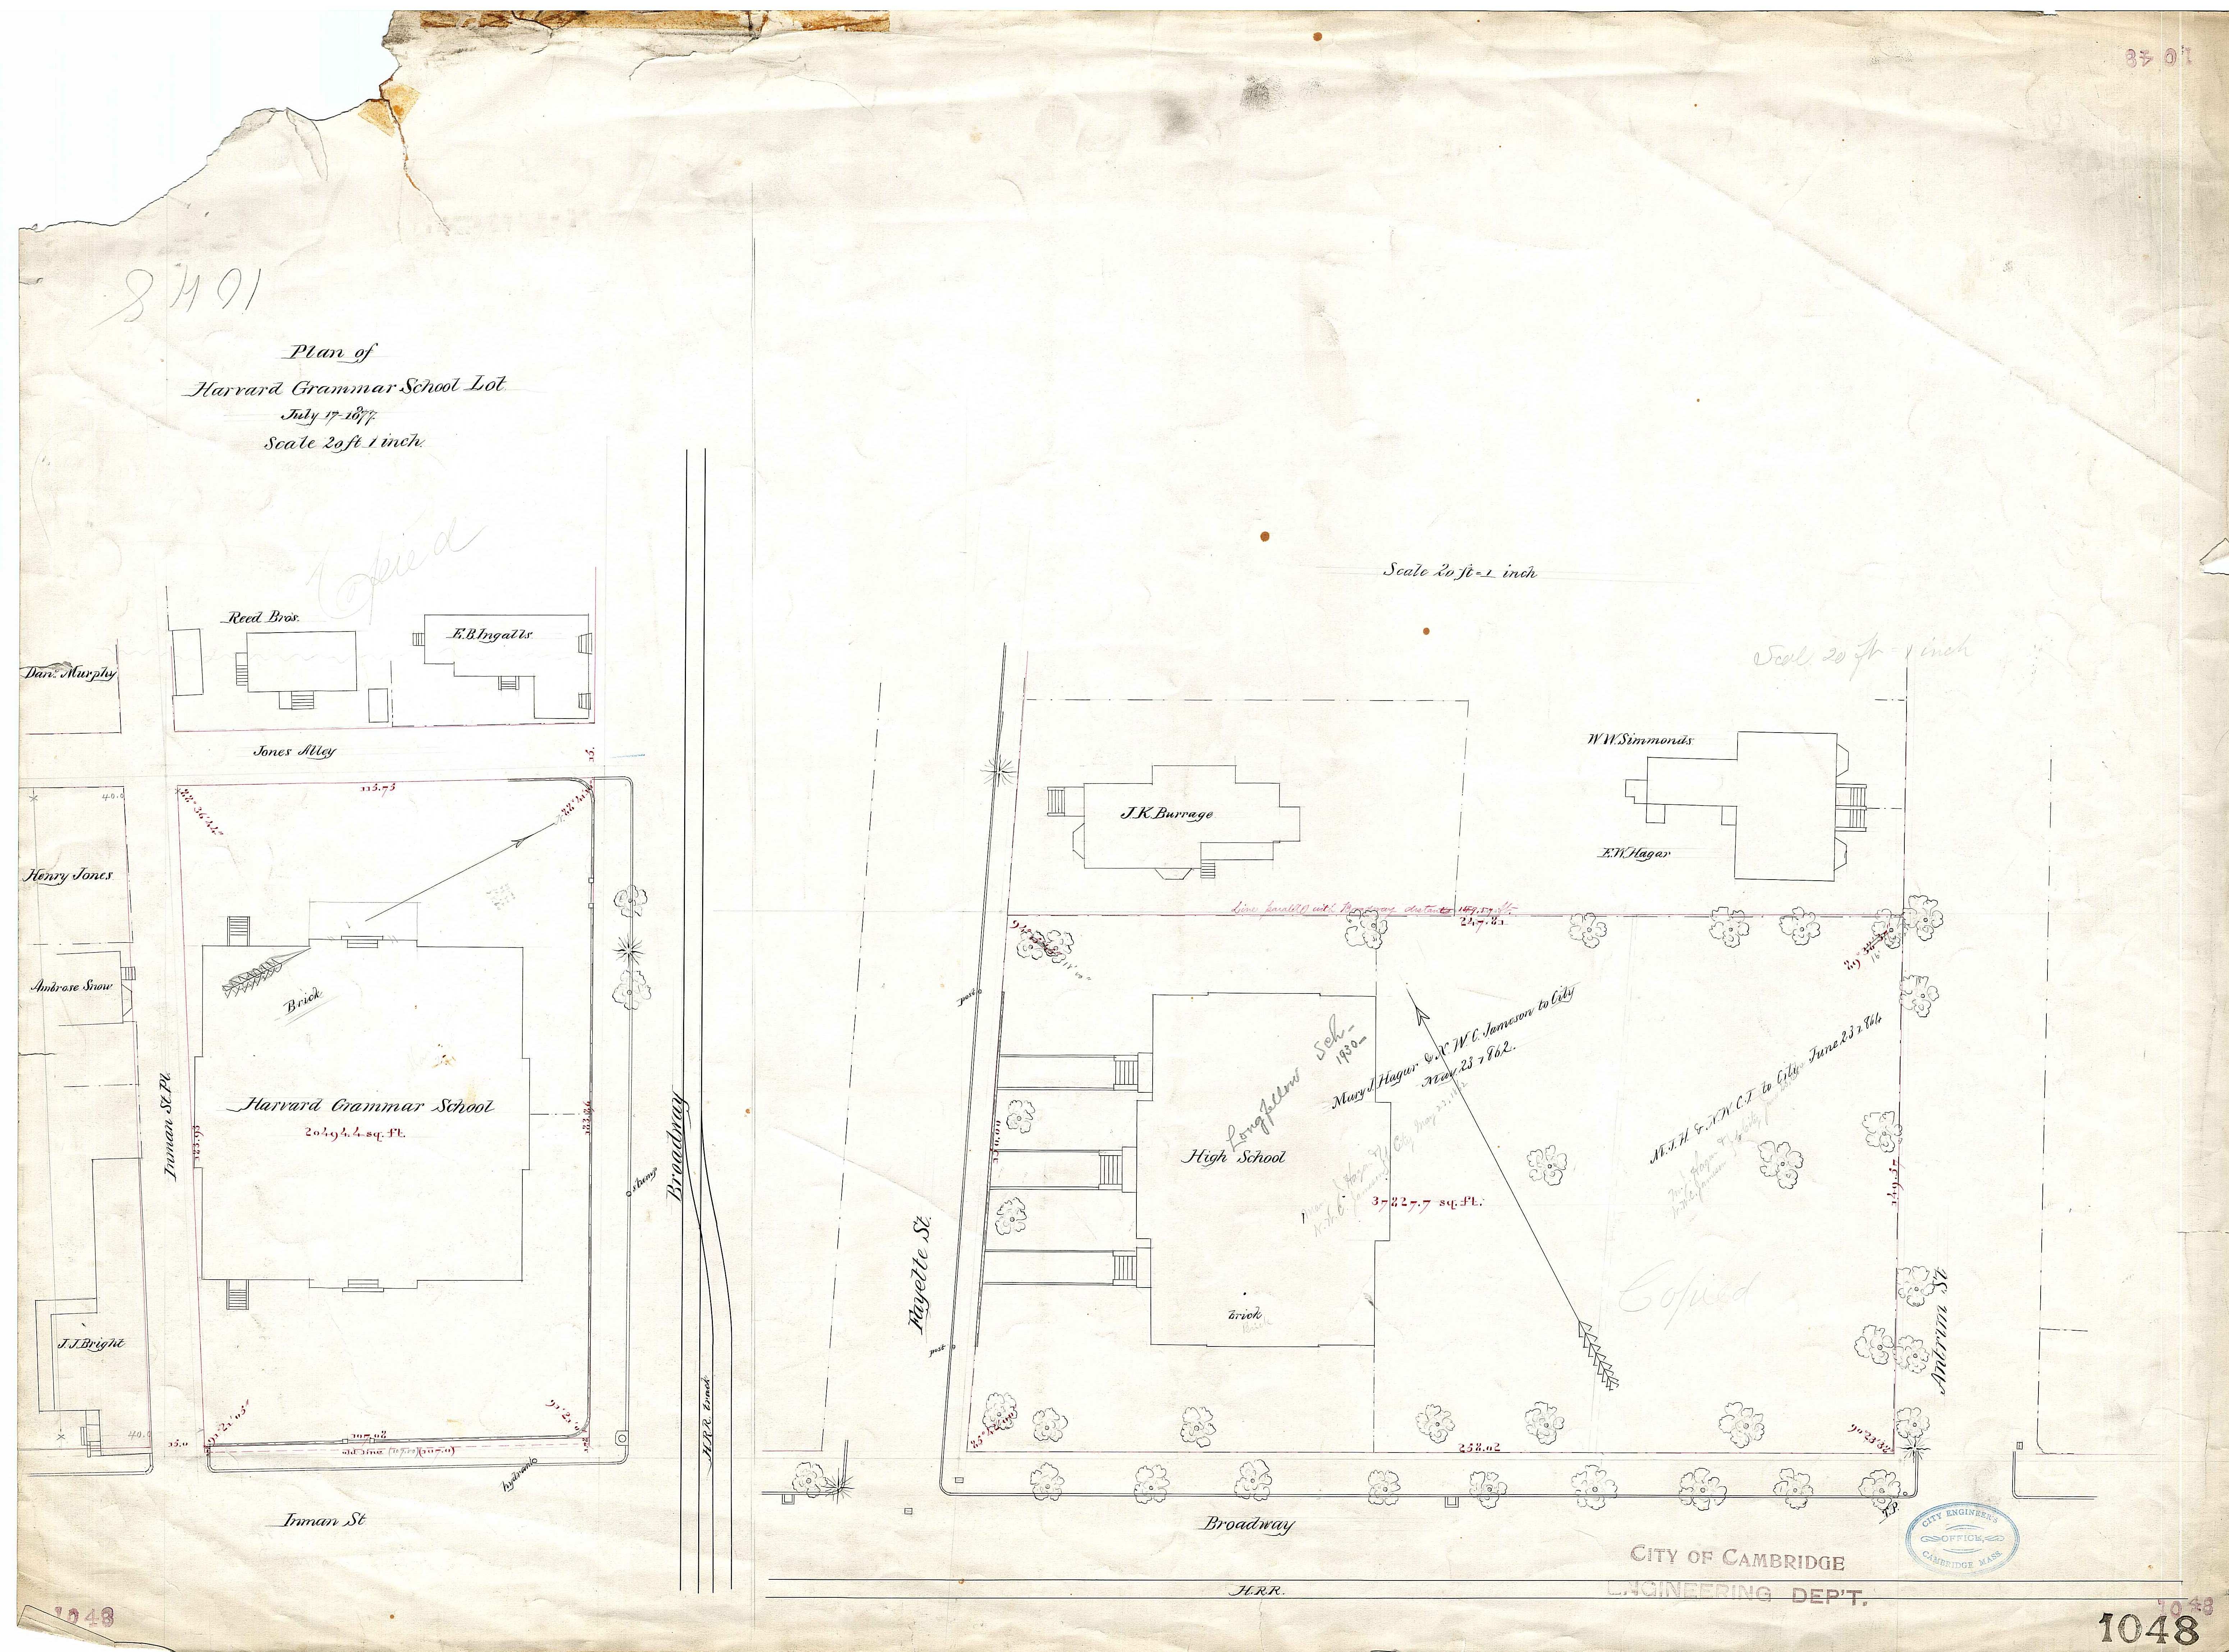 247 Churchill Avenue Survey Lot 0019 1858 Http 248 19775 0 Gm Engine Diagram 1048